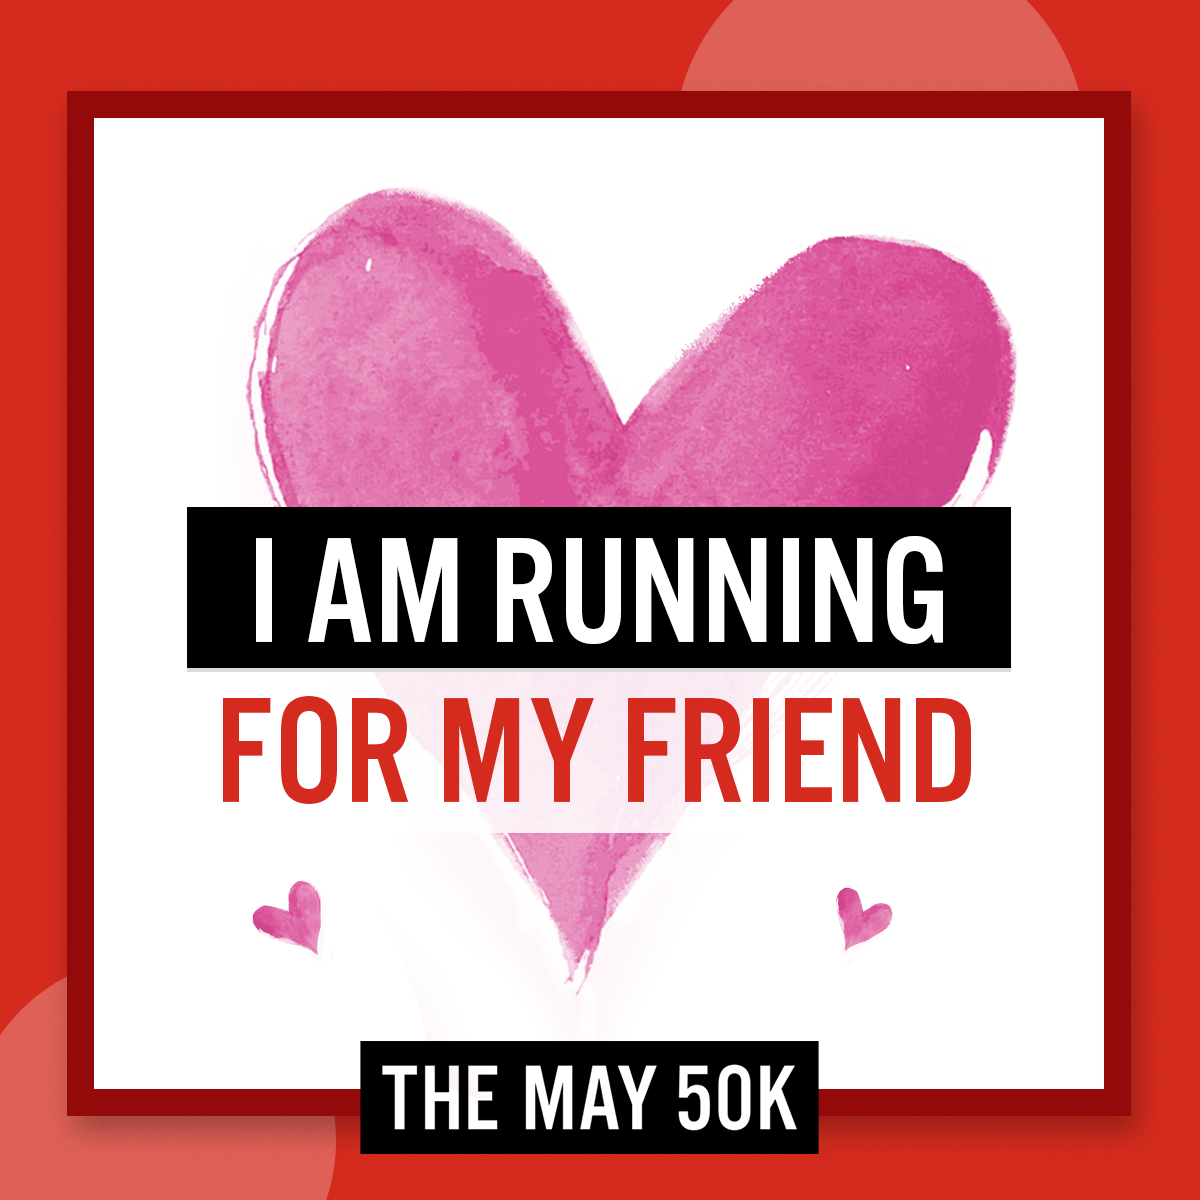 Social Posts - Run For Friend